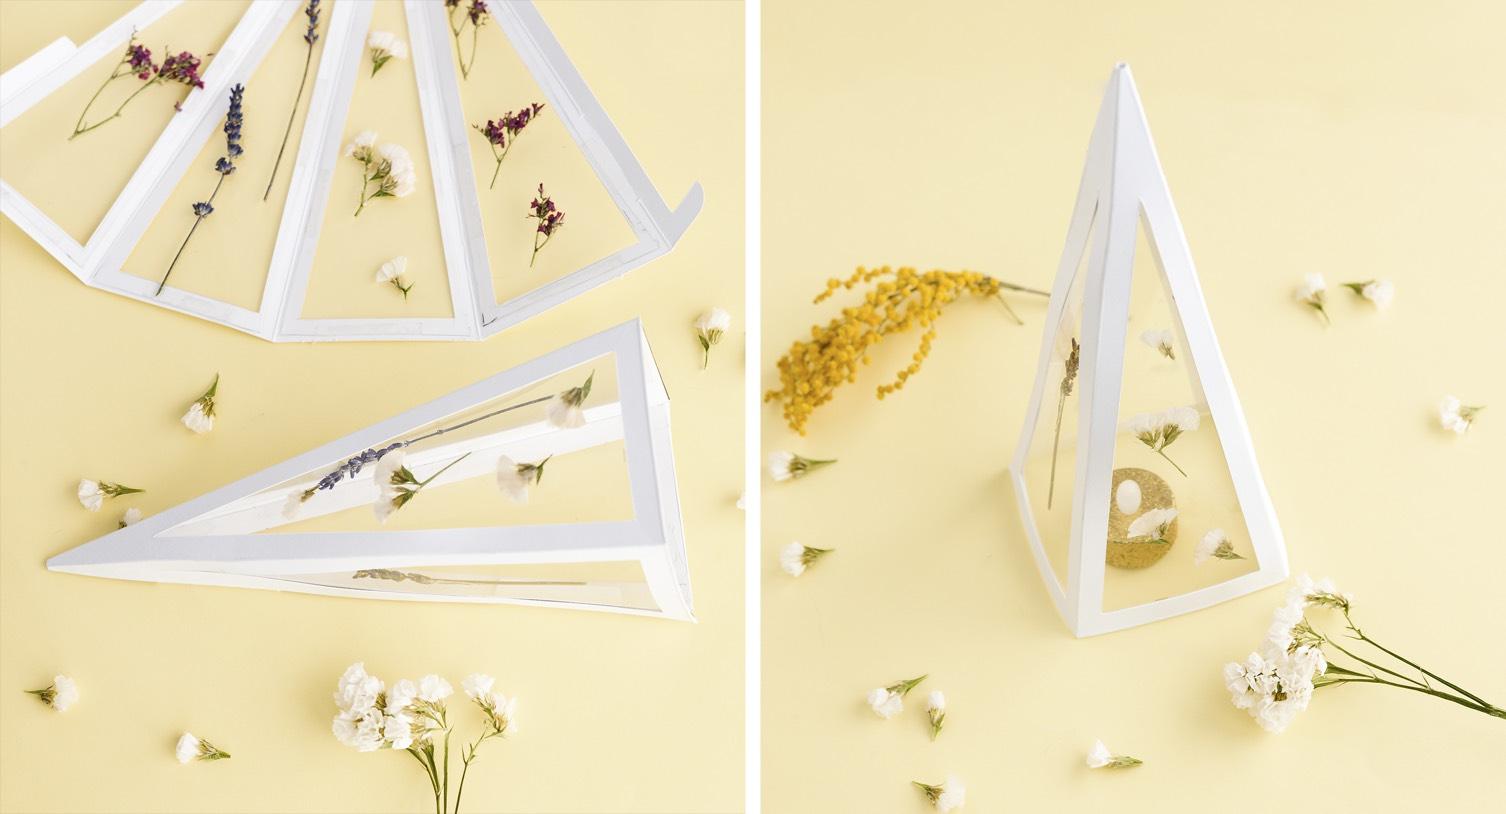 Como hacer una piramide botánica - 4